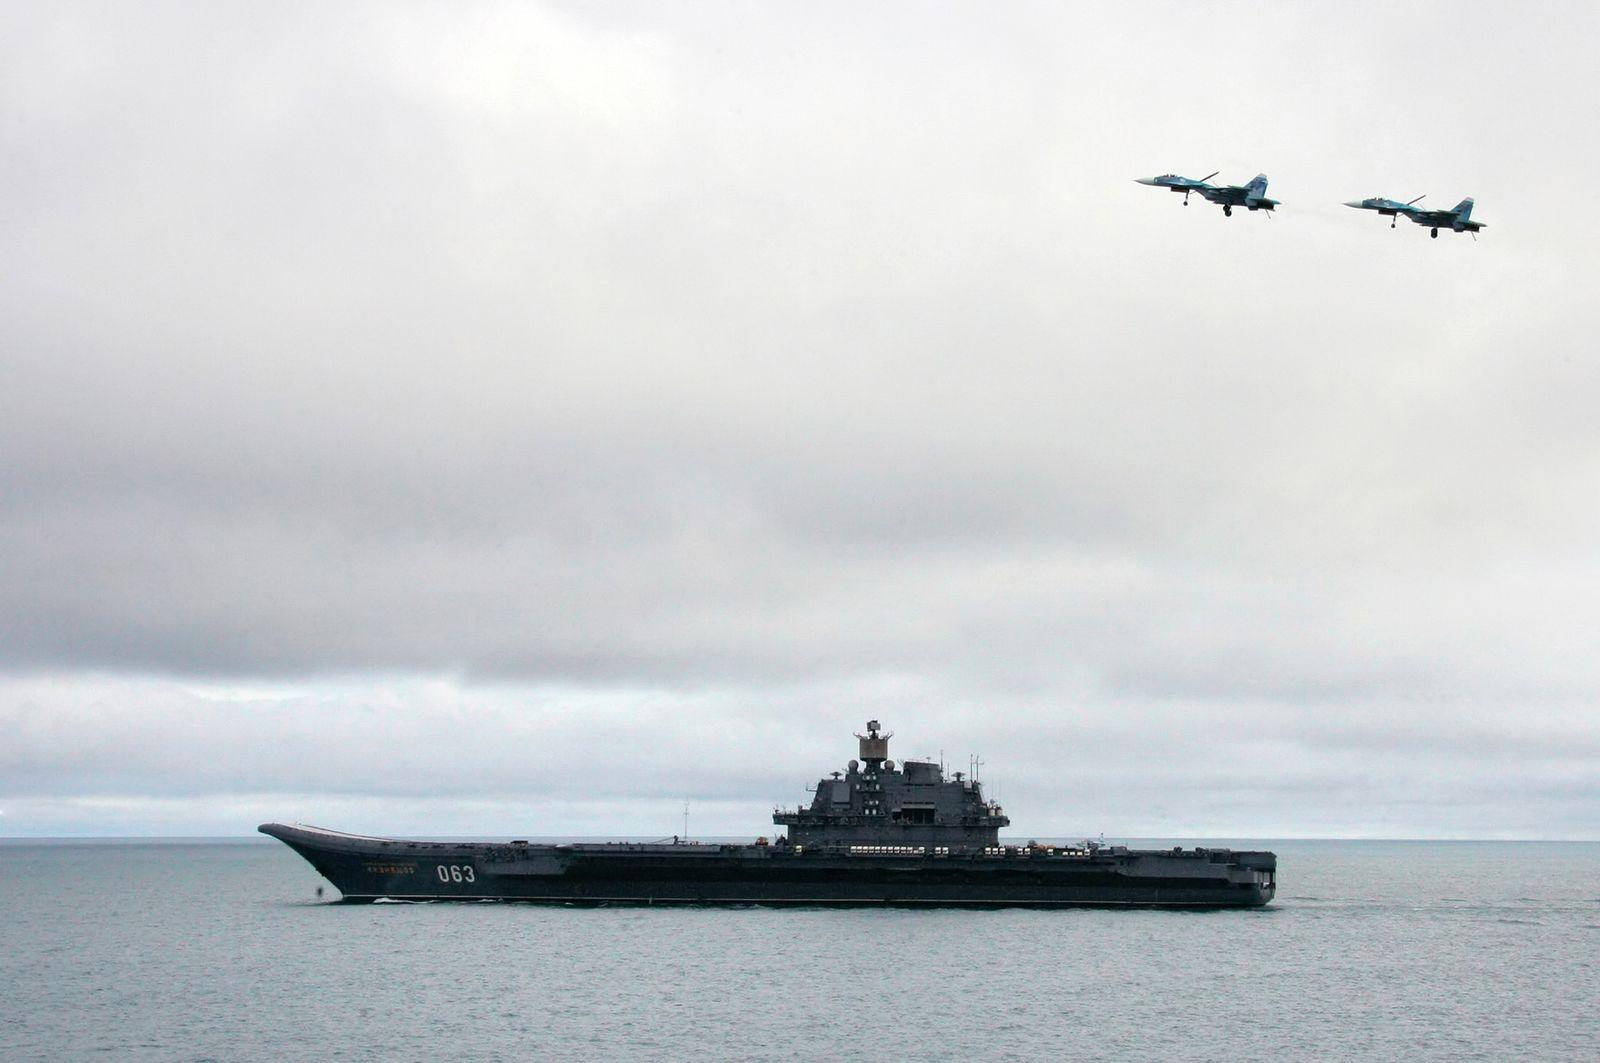 Russischer Flugzeugträger/ Admiral Kuzhetsov